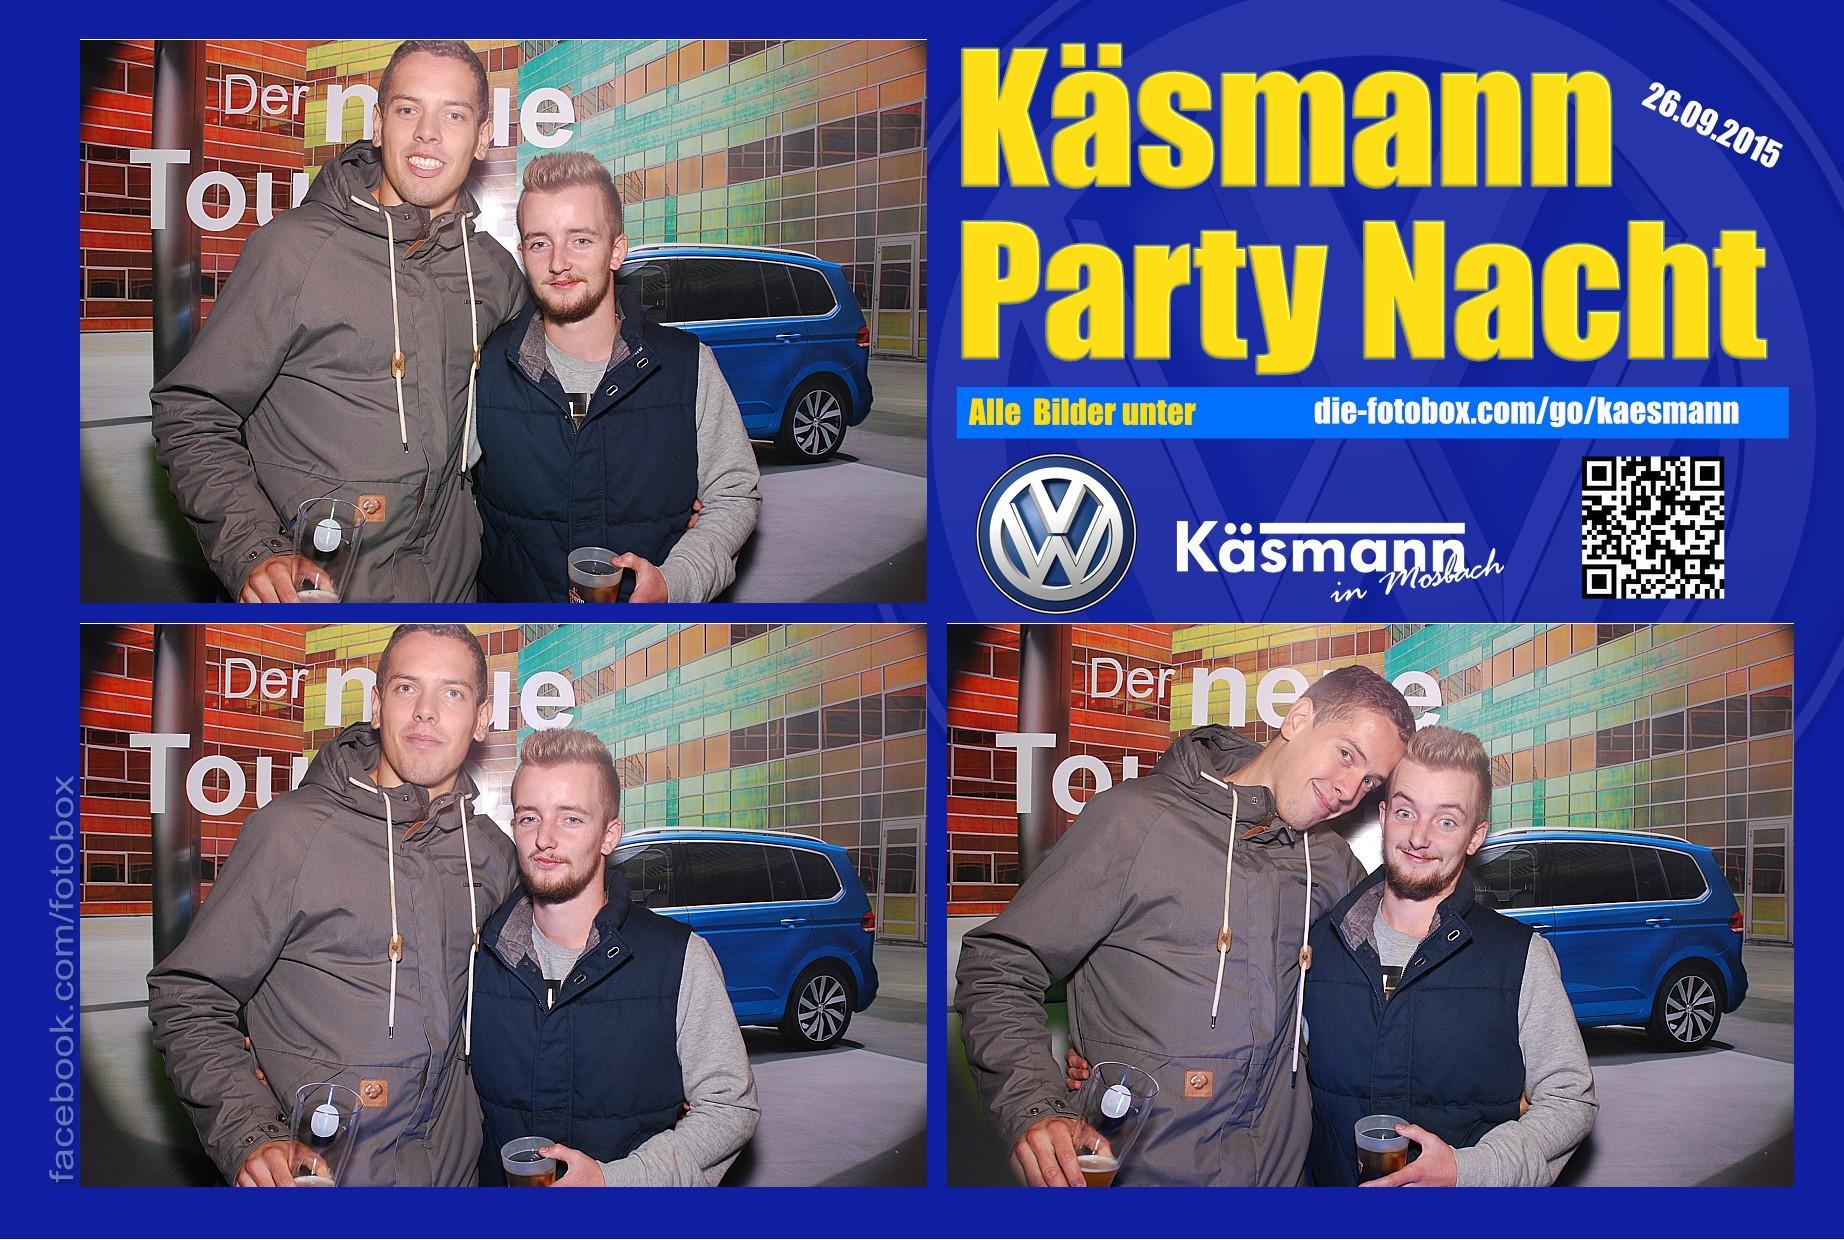 Käsmannparty 2015 - www.die-fotobox.com 01192